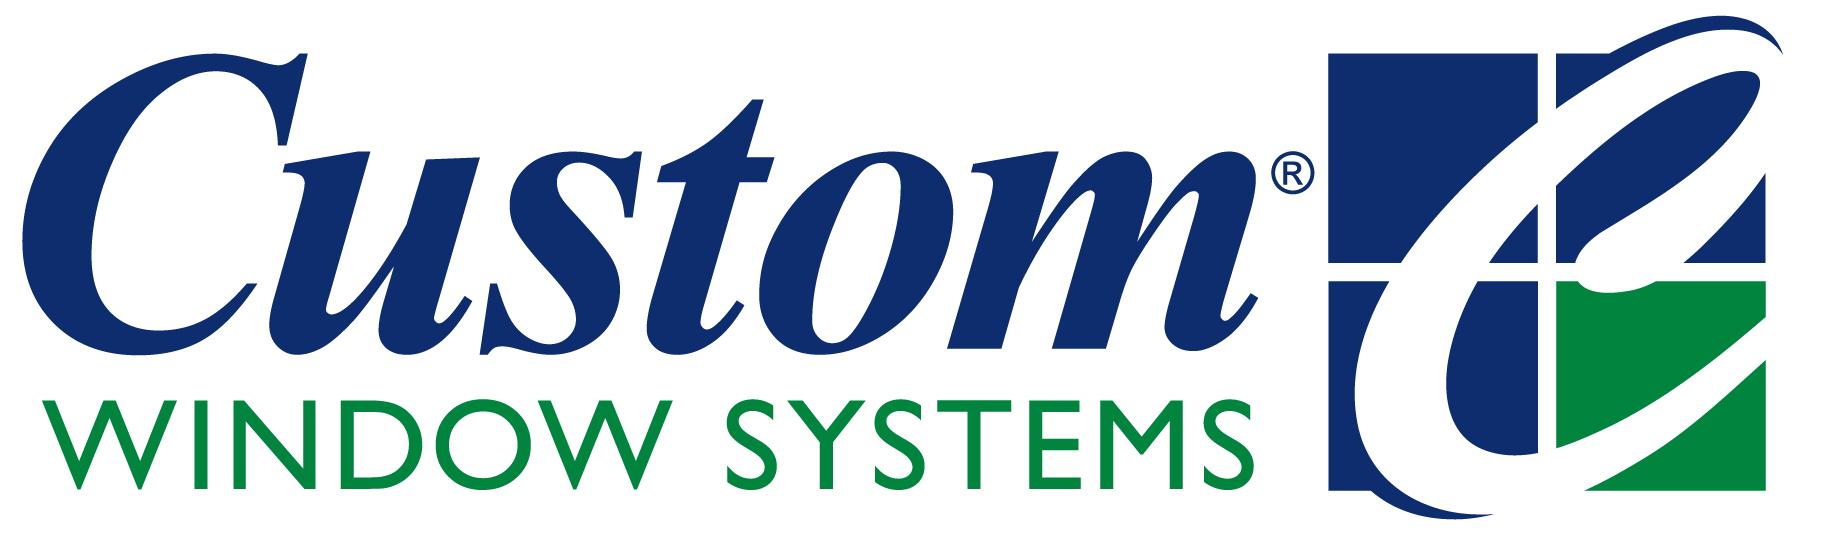 Orlando Window Companies Window Manufacturers List Of